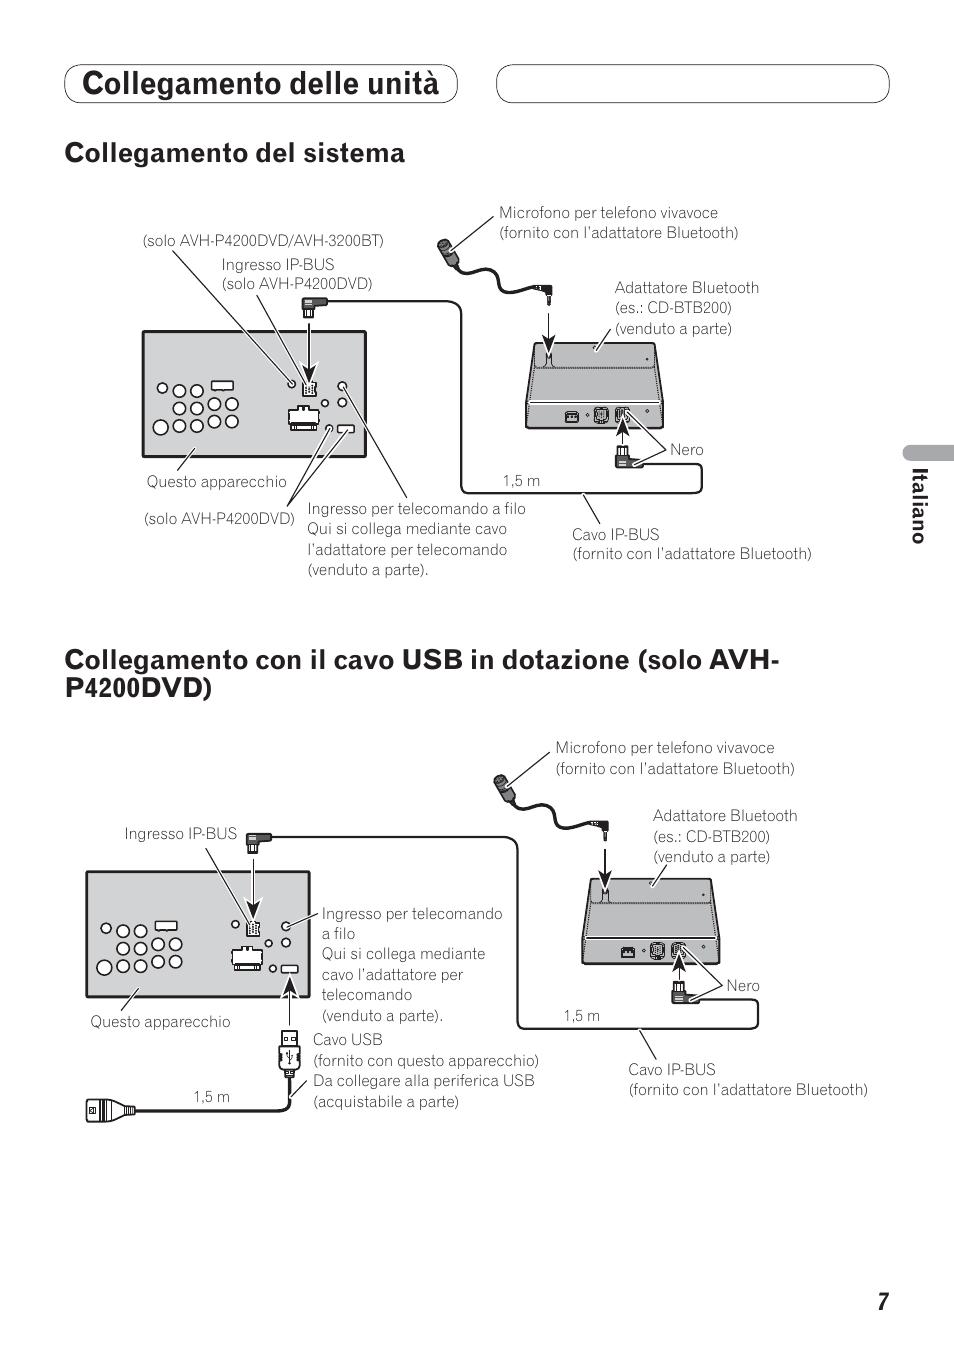 medium resolution of solo avh p4200dvd collegamento delle unit pioneer avh p4200dvd pioneer bypass parking brake diagram wiring diagram for pioneer avh p4200dvd